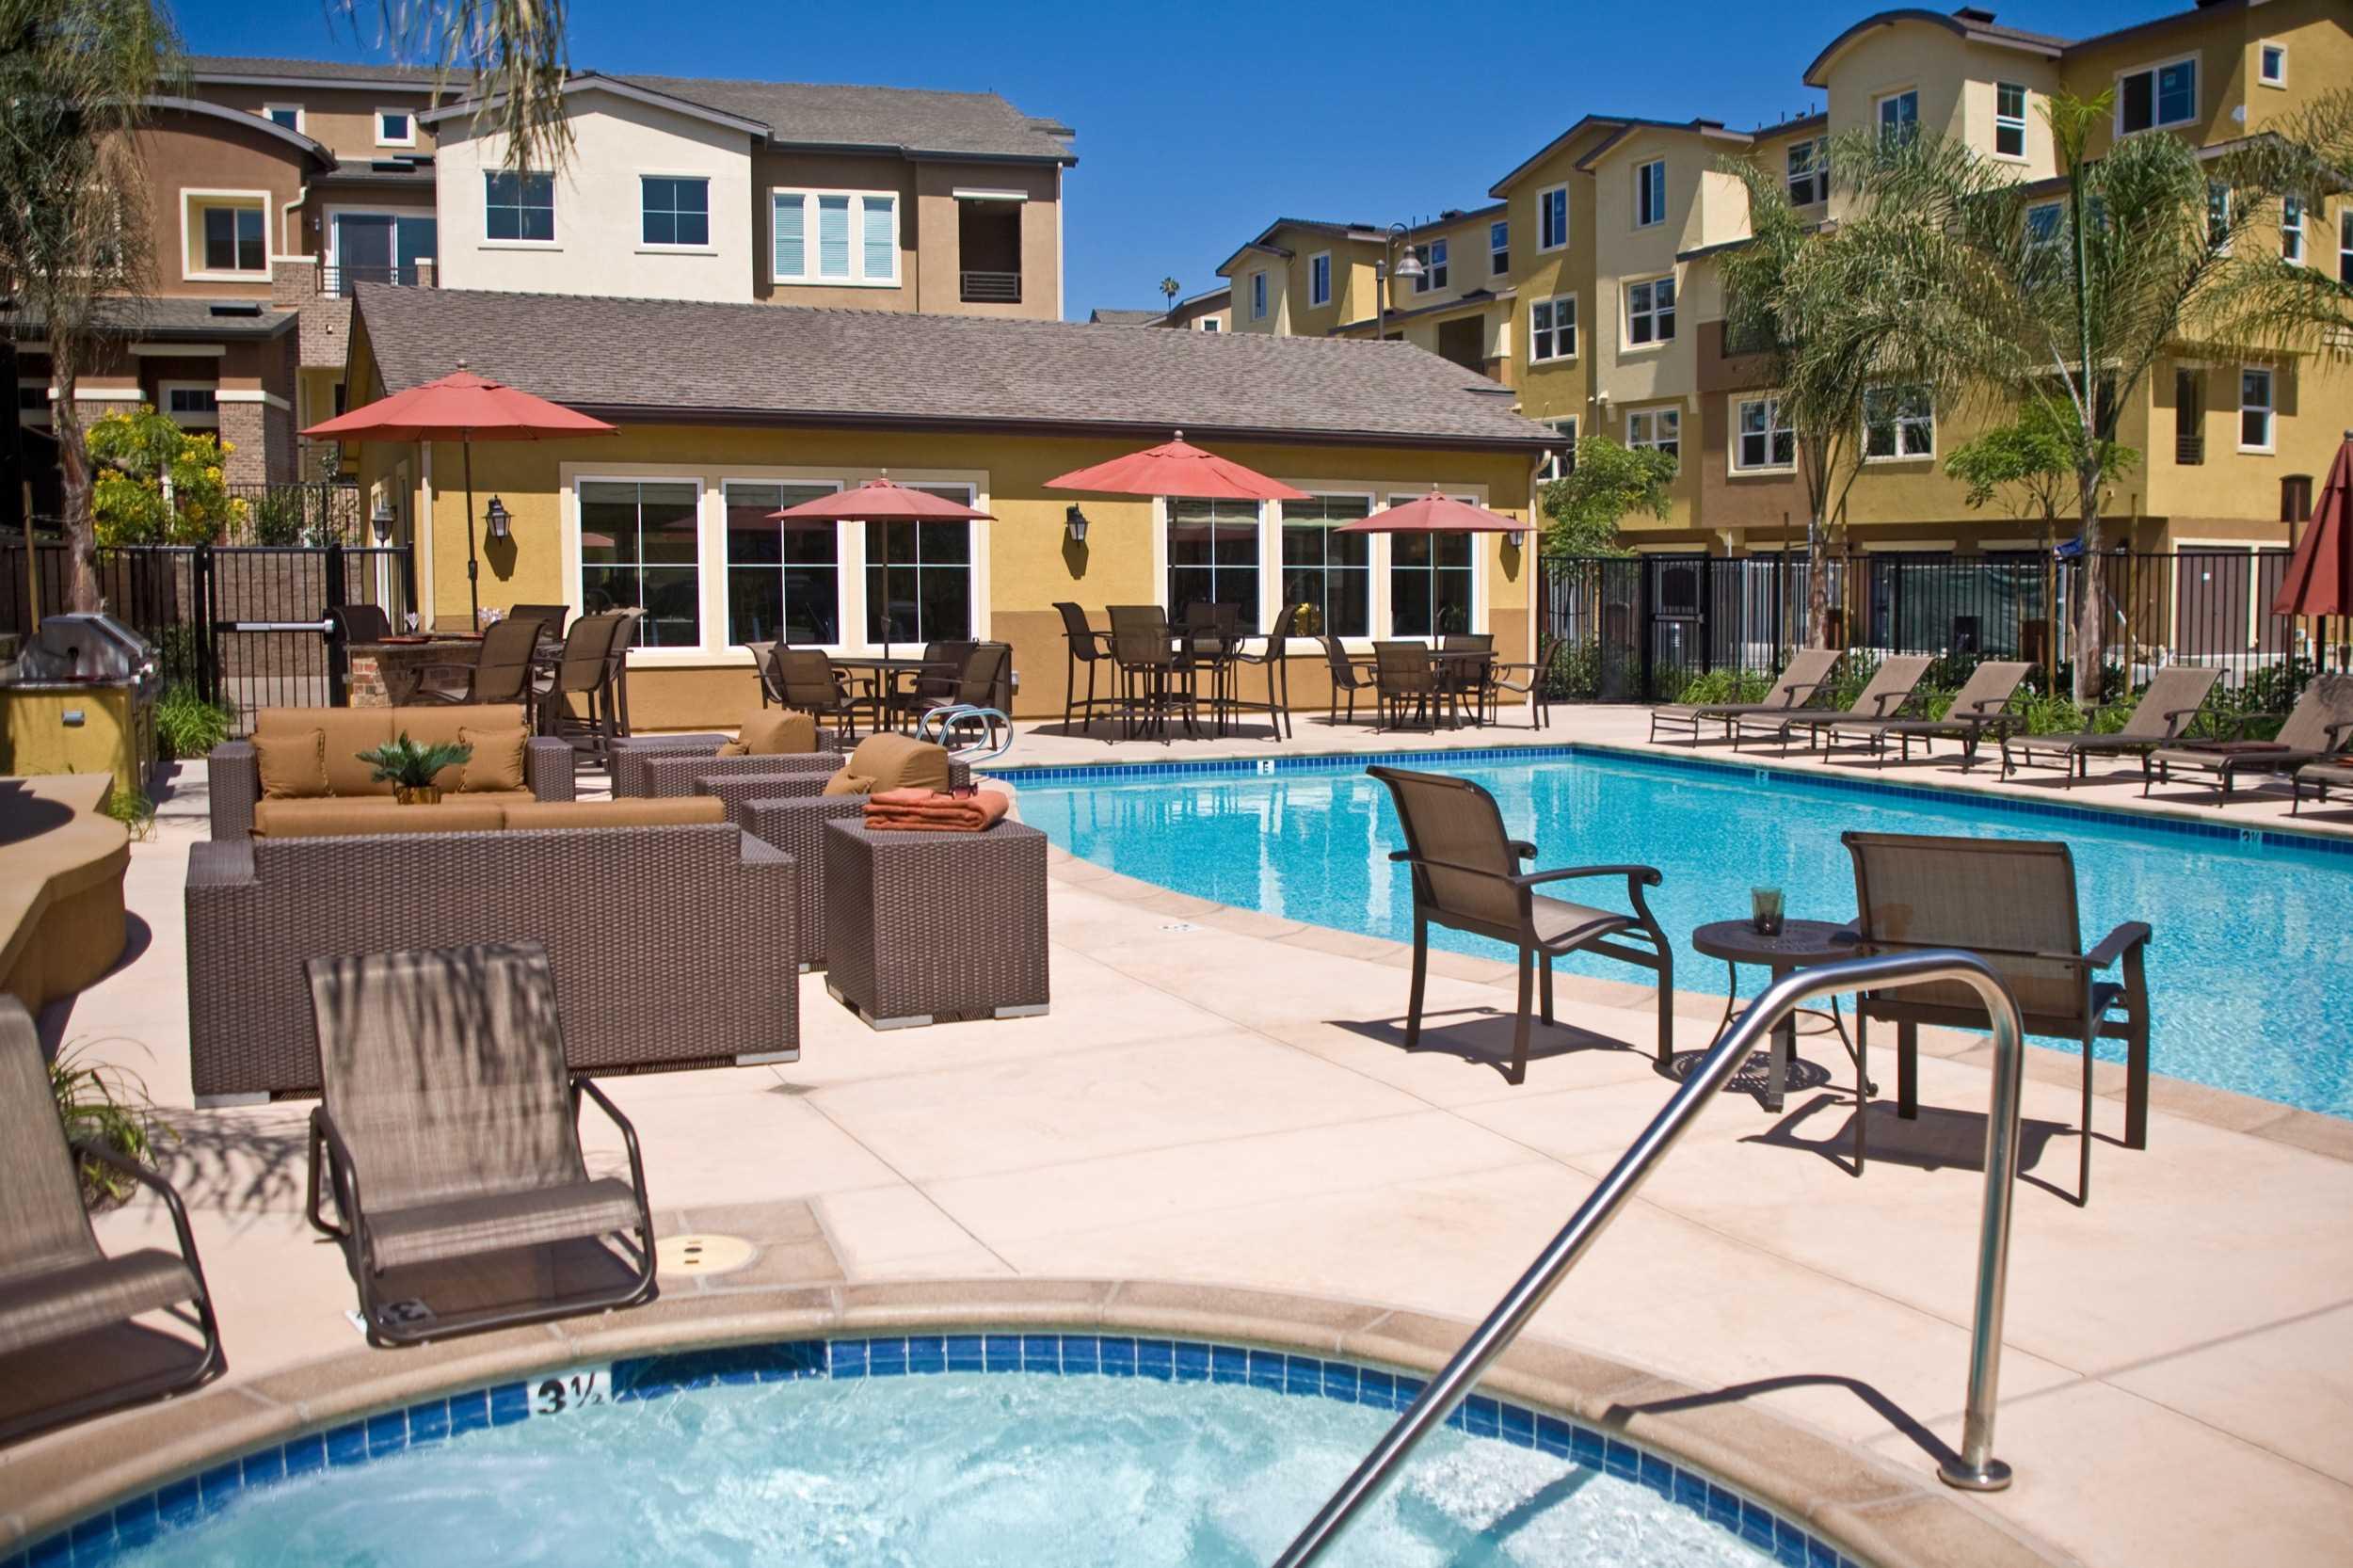 San Bernardino Housing, Other Economic Indicators, Are Up